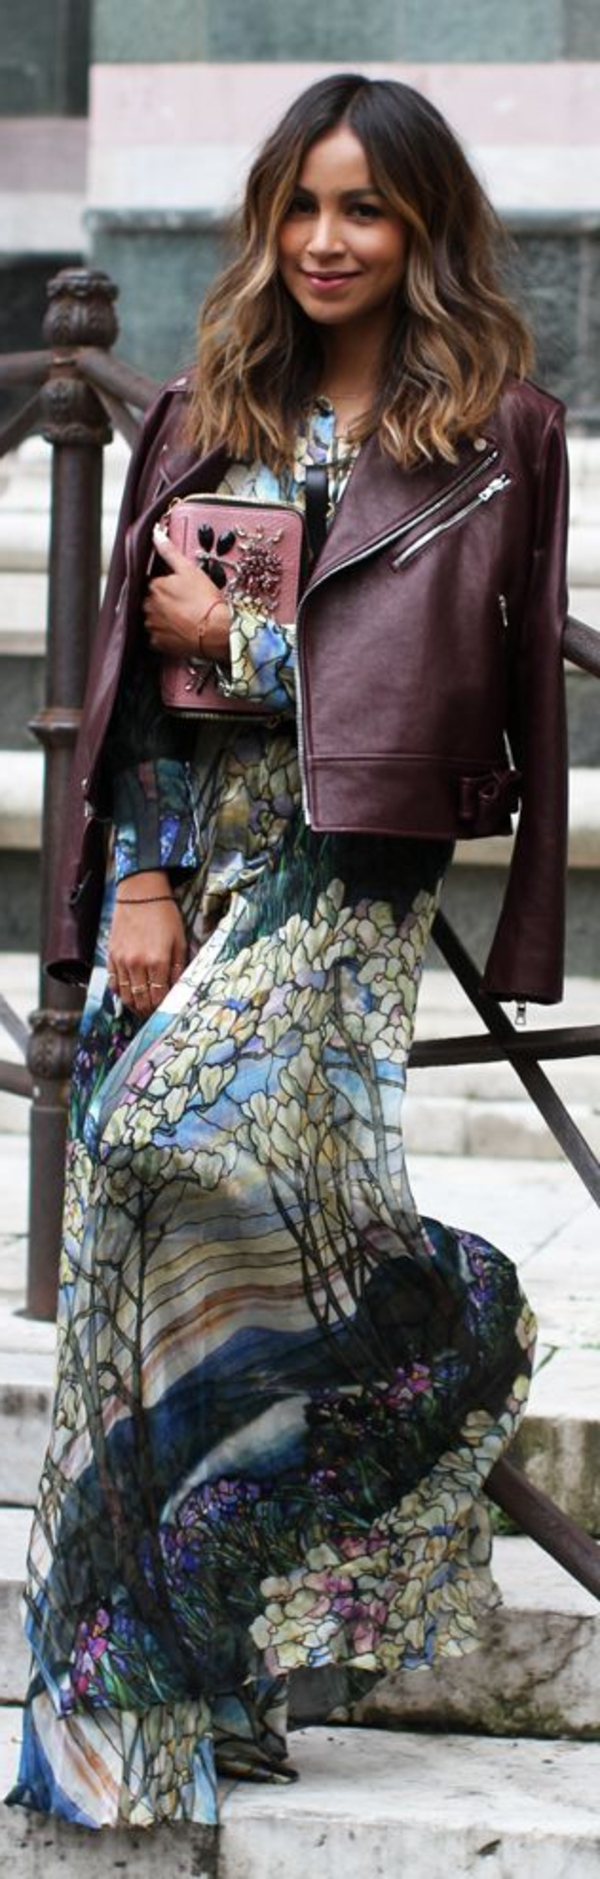 Blazer-en-cuir-tenue-spéciale-flottante-robe-longue